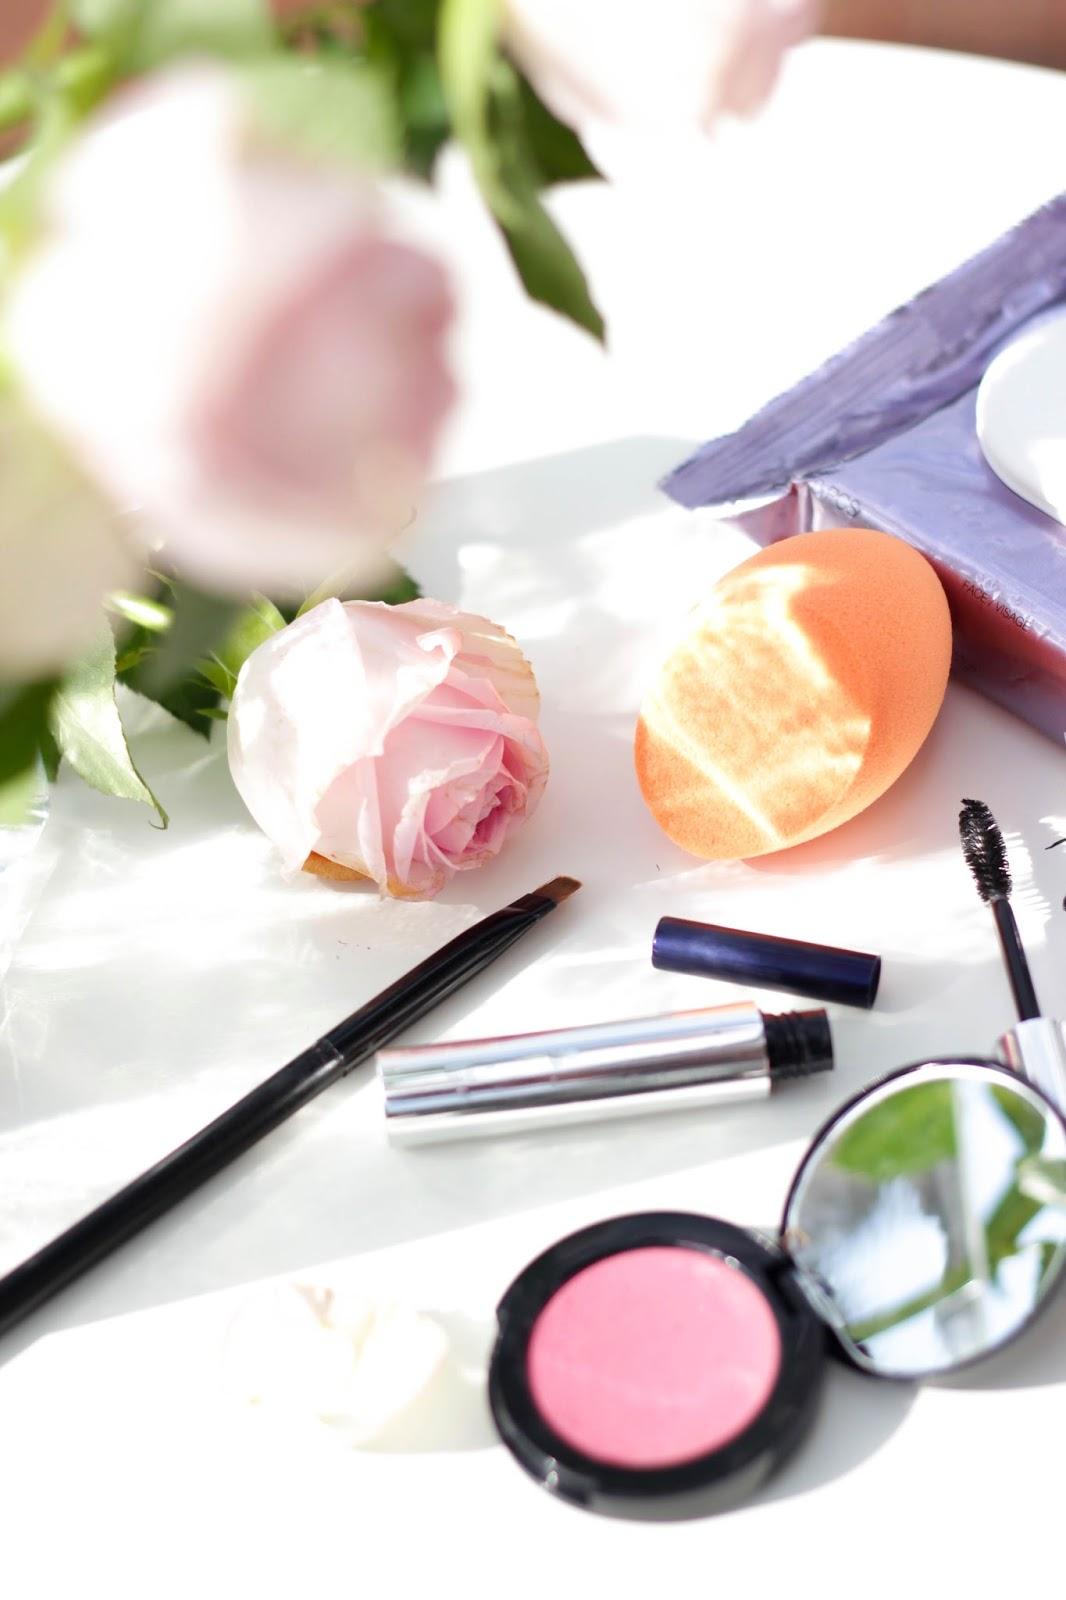 Über 40 Beauty Blog